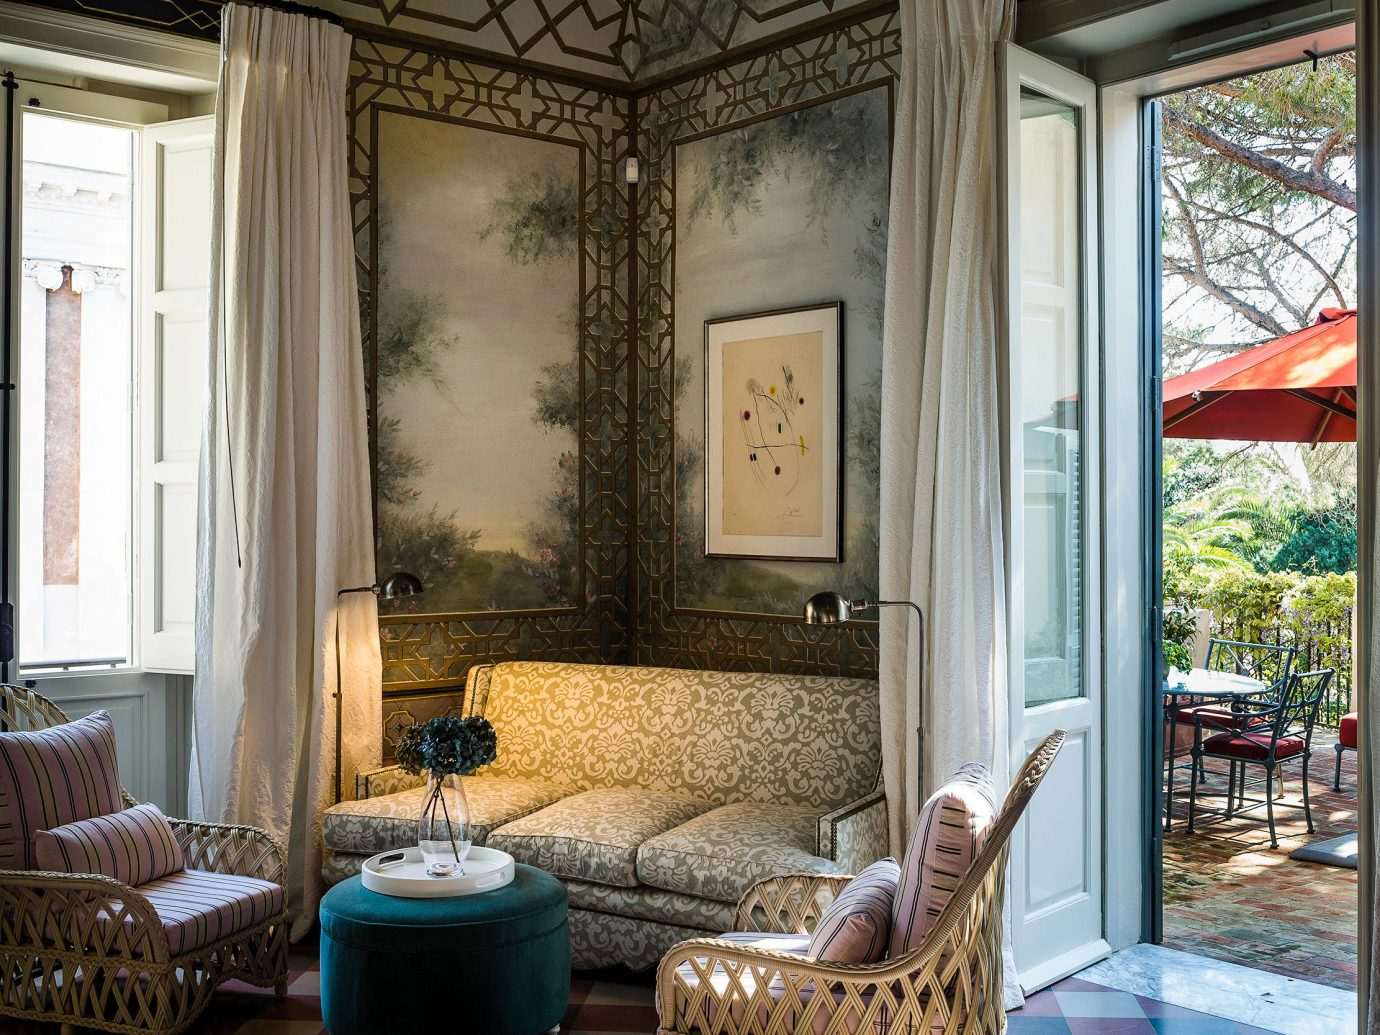 Celebs Hotels room interior design home window living room real estate house estate window treatment door ceiling